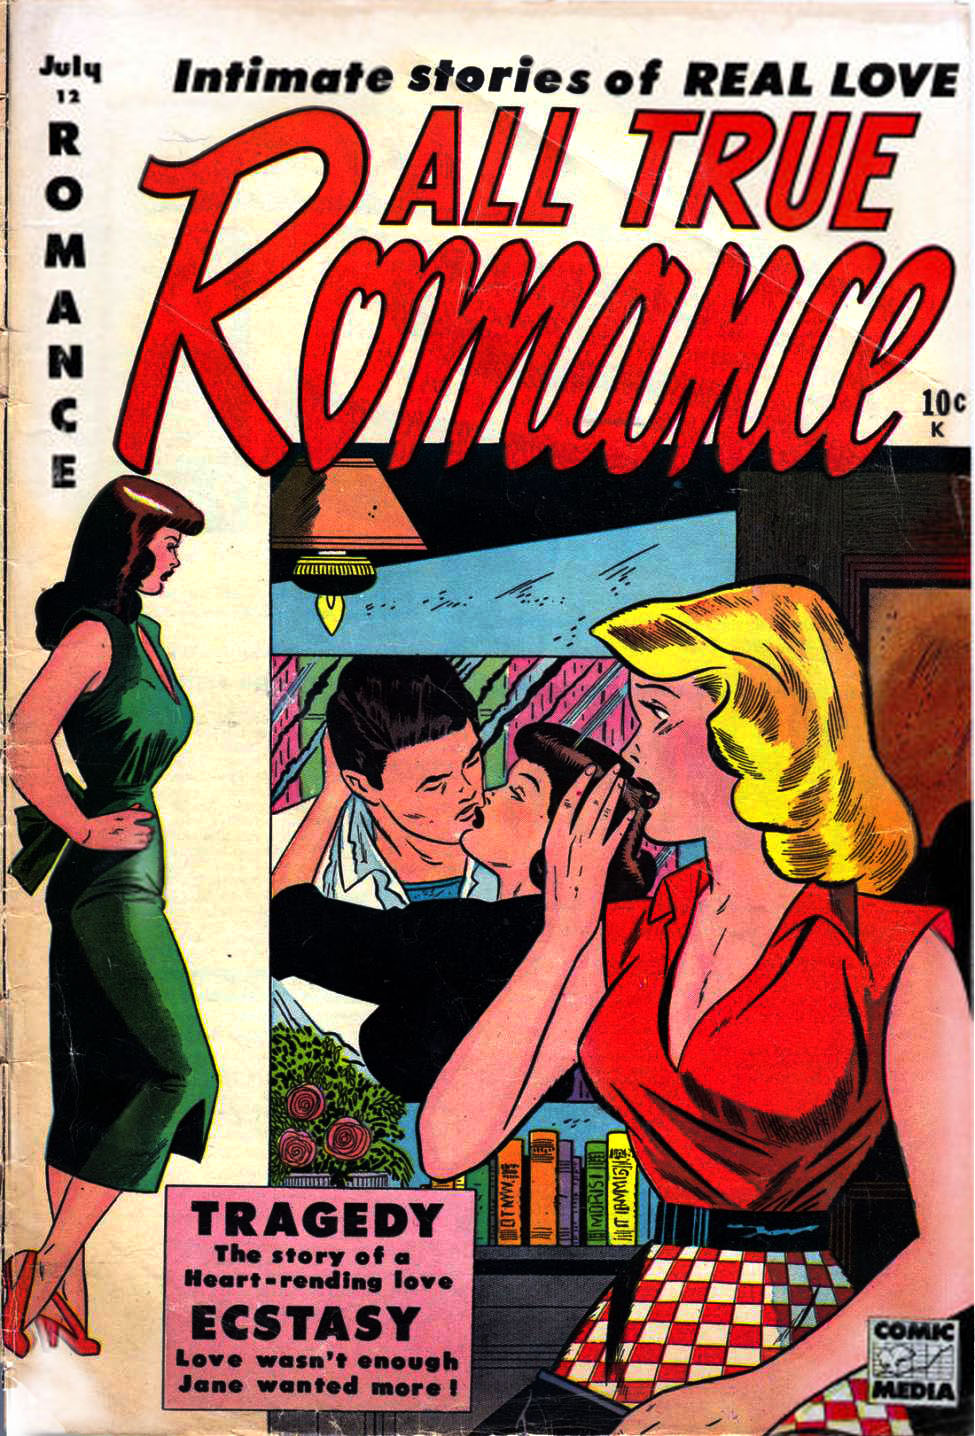 All True Romance #12 by Comic Media